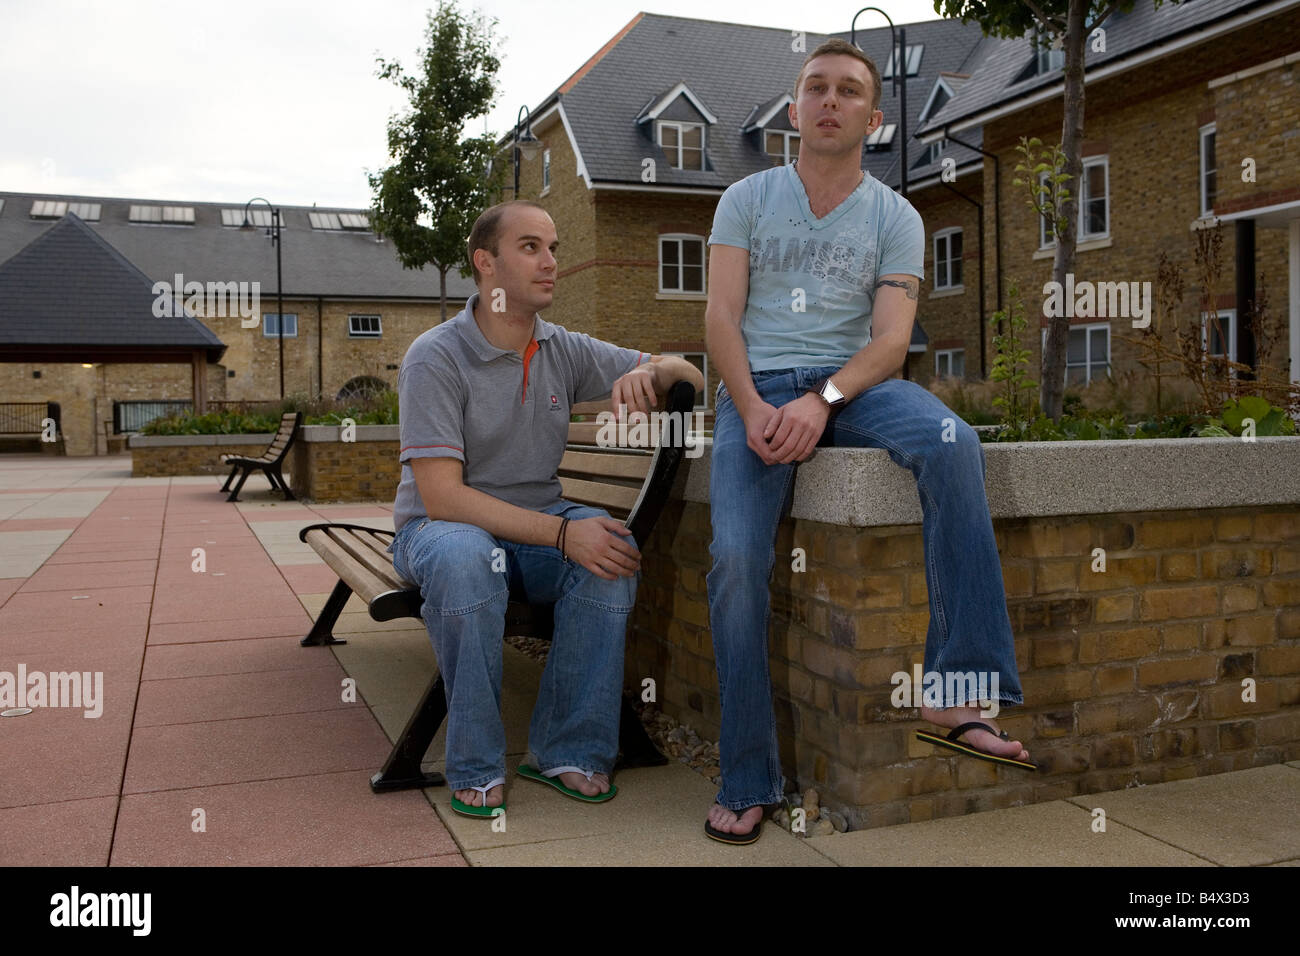 Fashionable homosexual pair